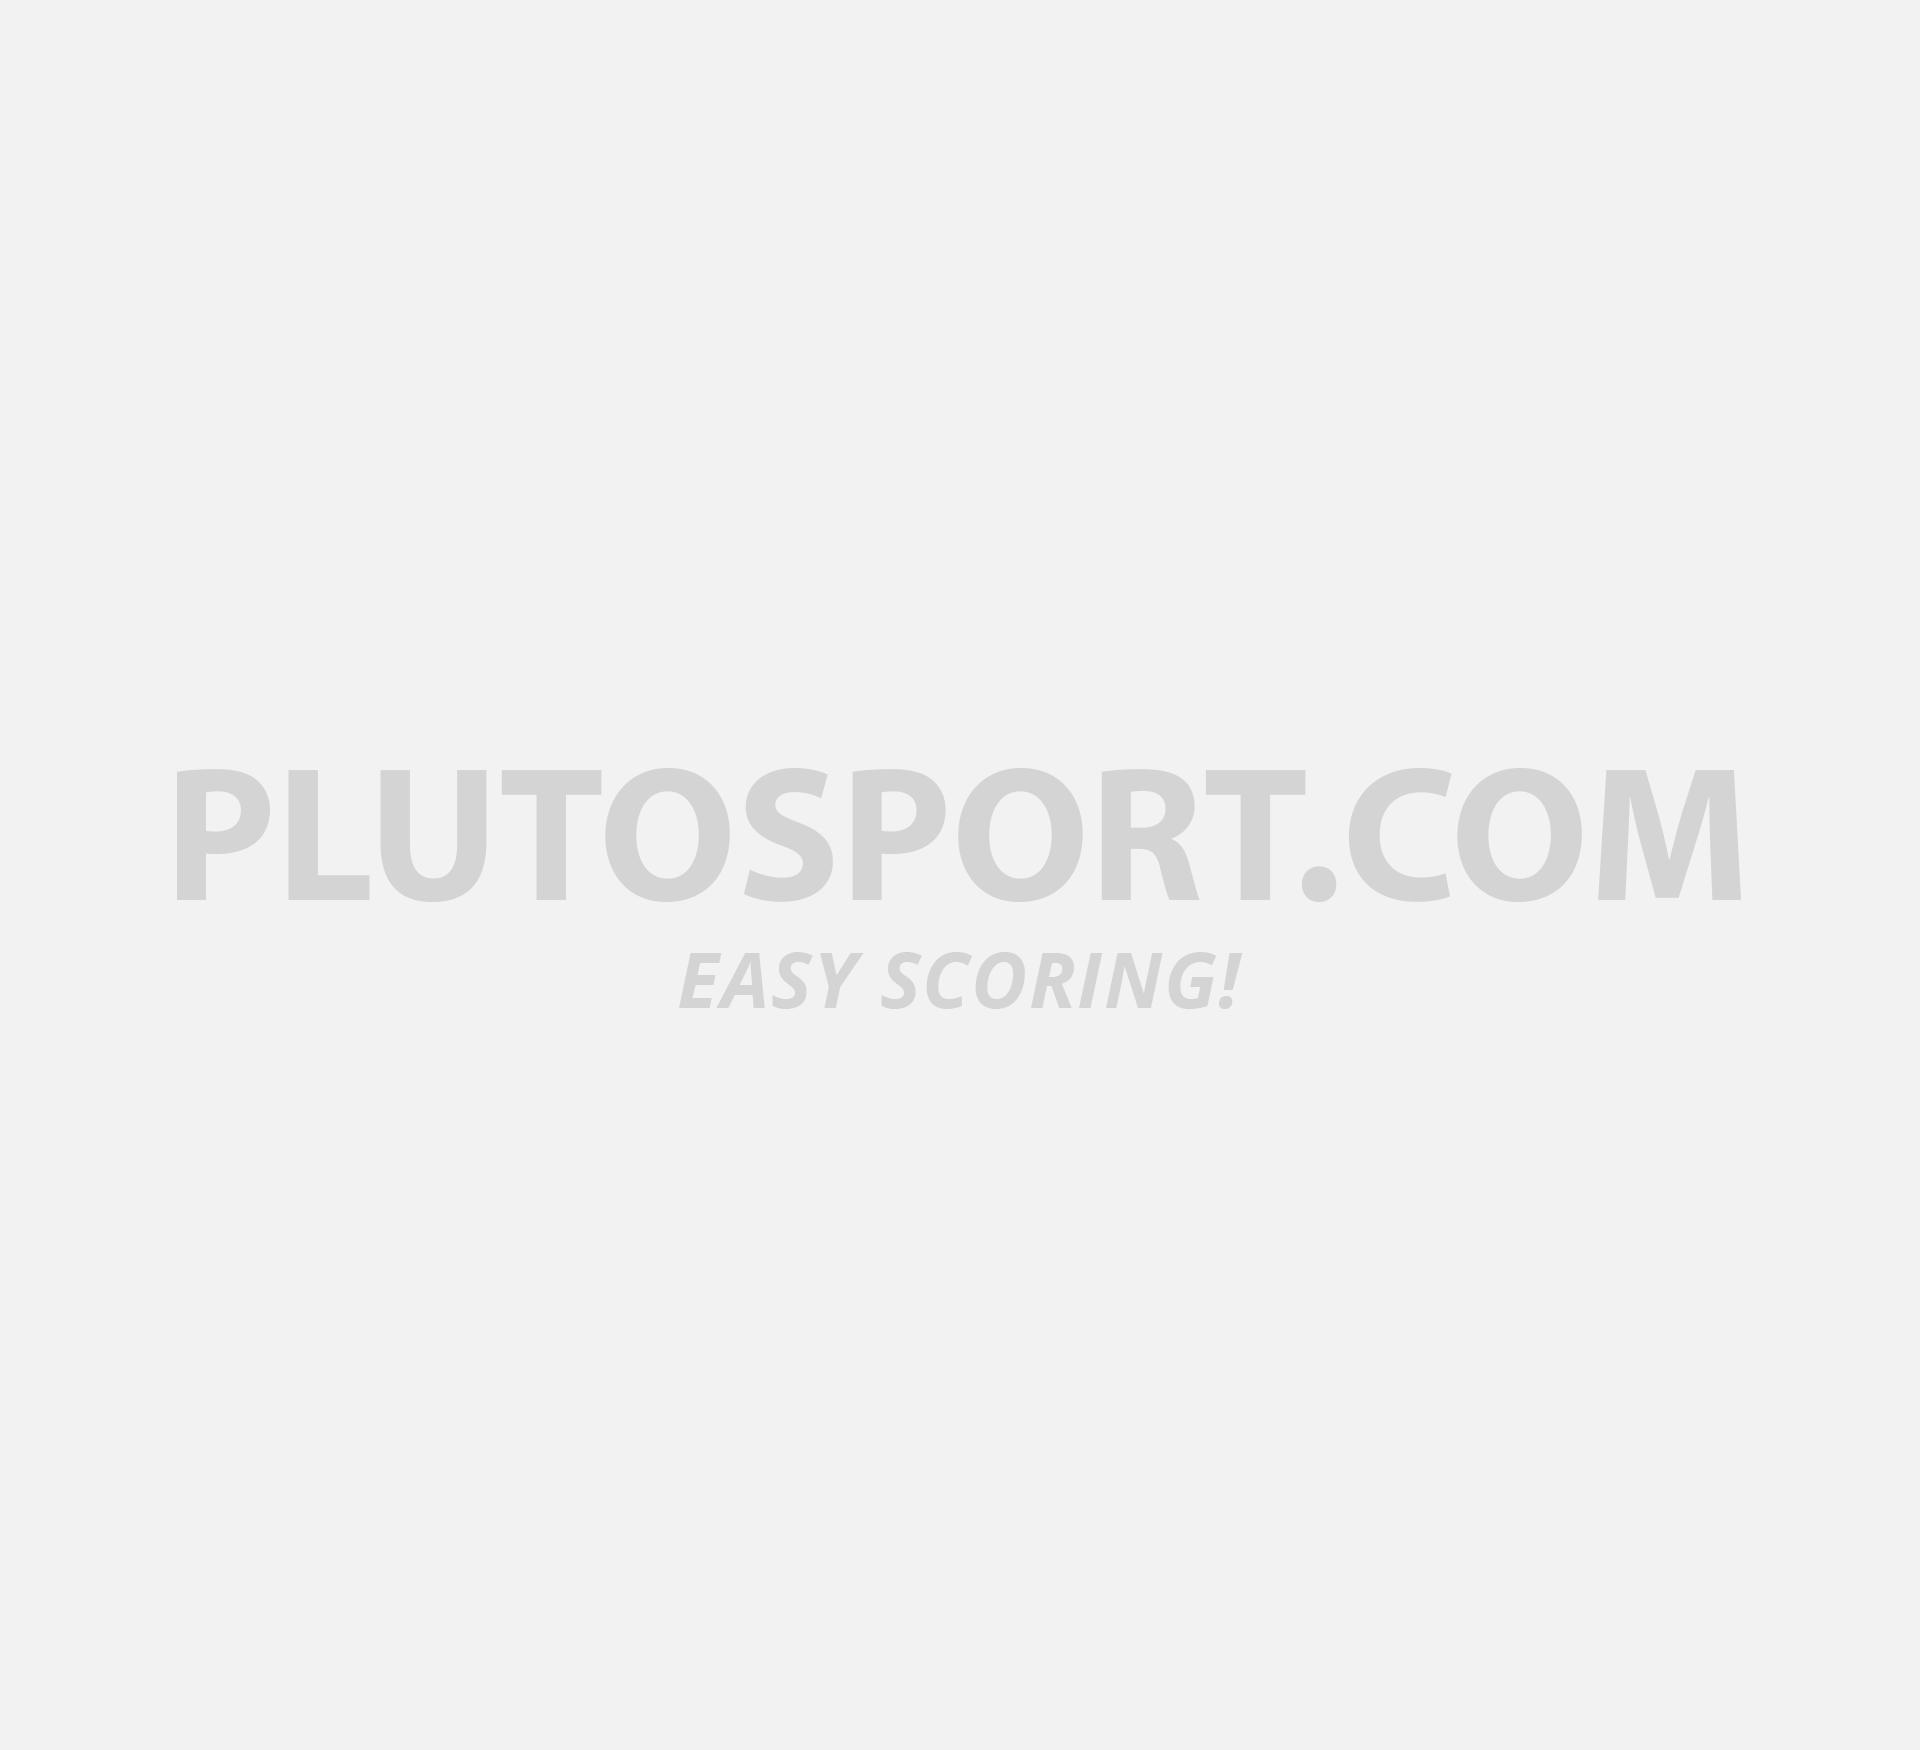 e24d24023c Lacoste Men's Colorblock Taffeta Swim Trunks - Shorts - Clothing - Bath &  Beach - Sports | Plutosport